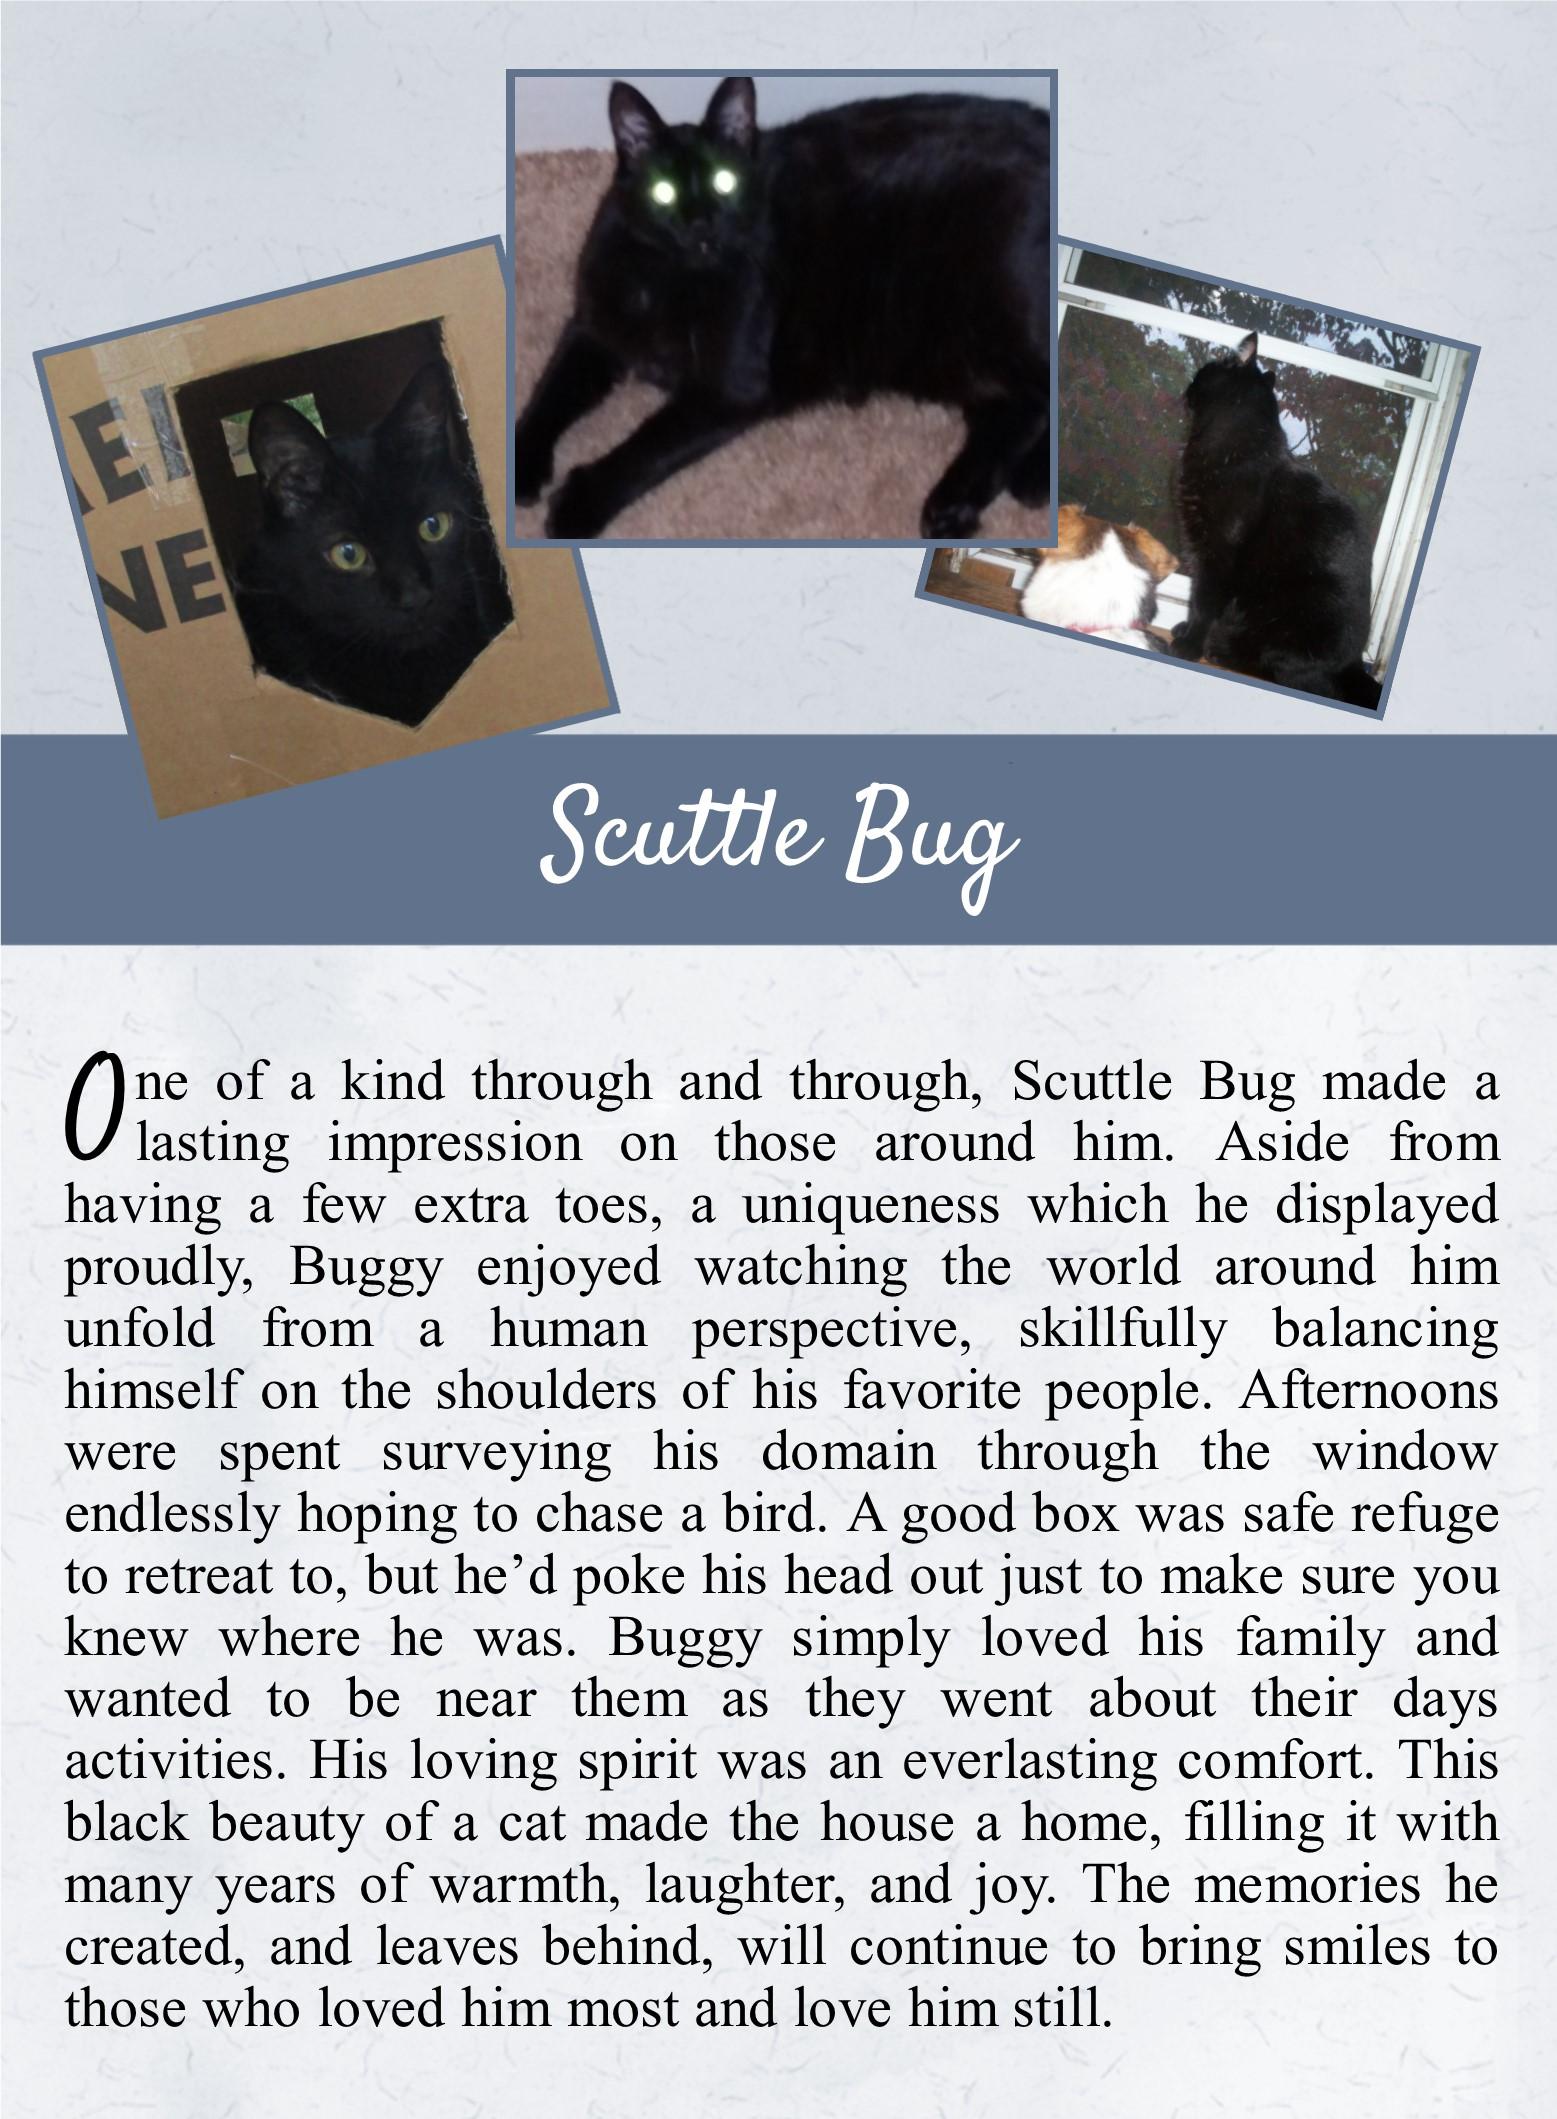 Scuttle Bug - Life Tail.jpg